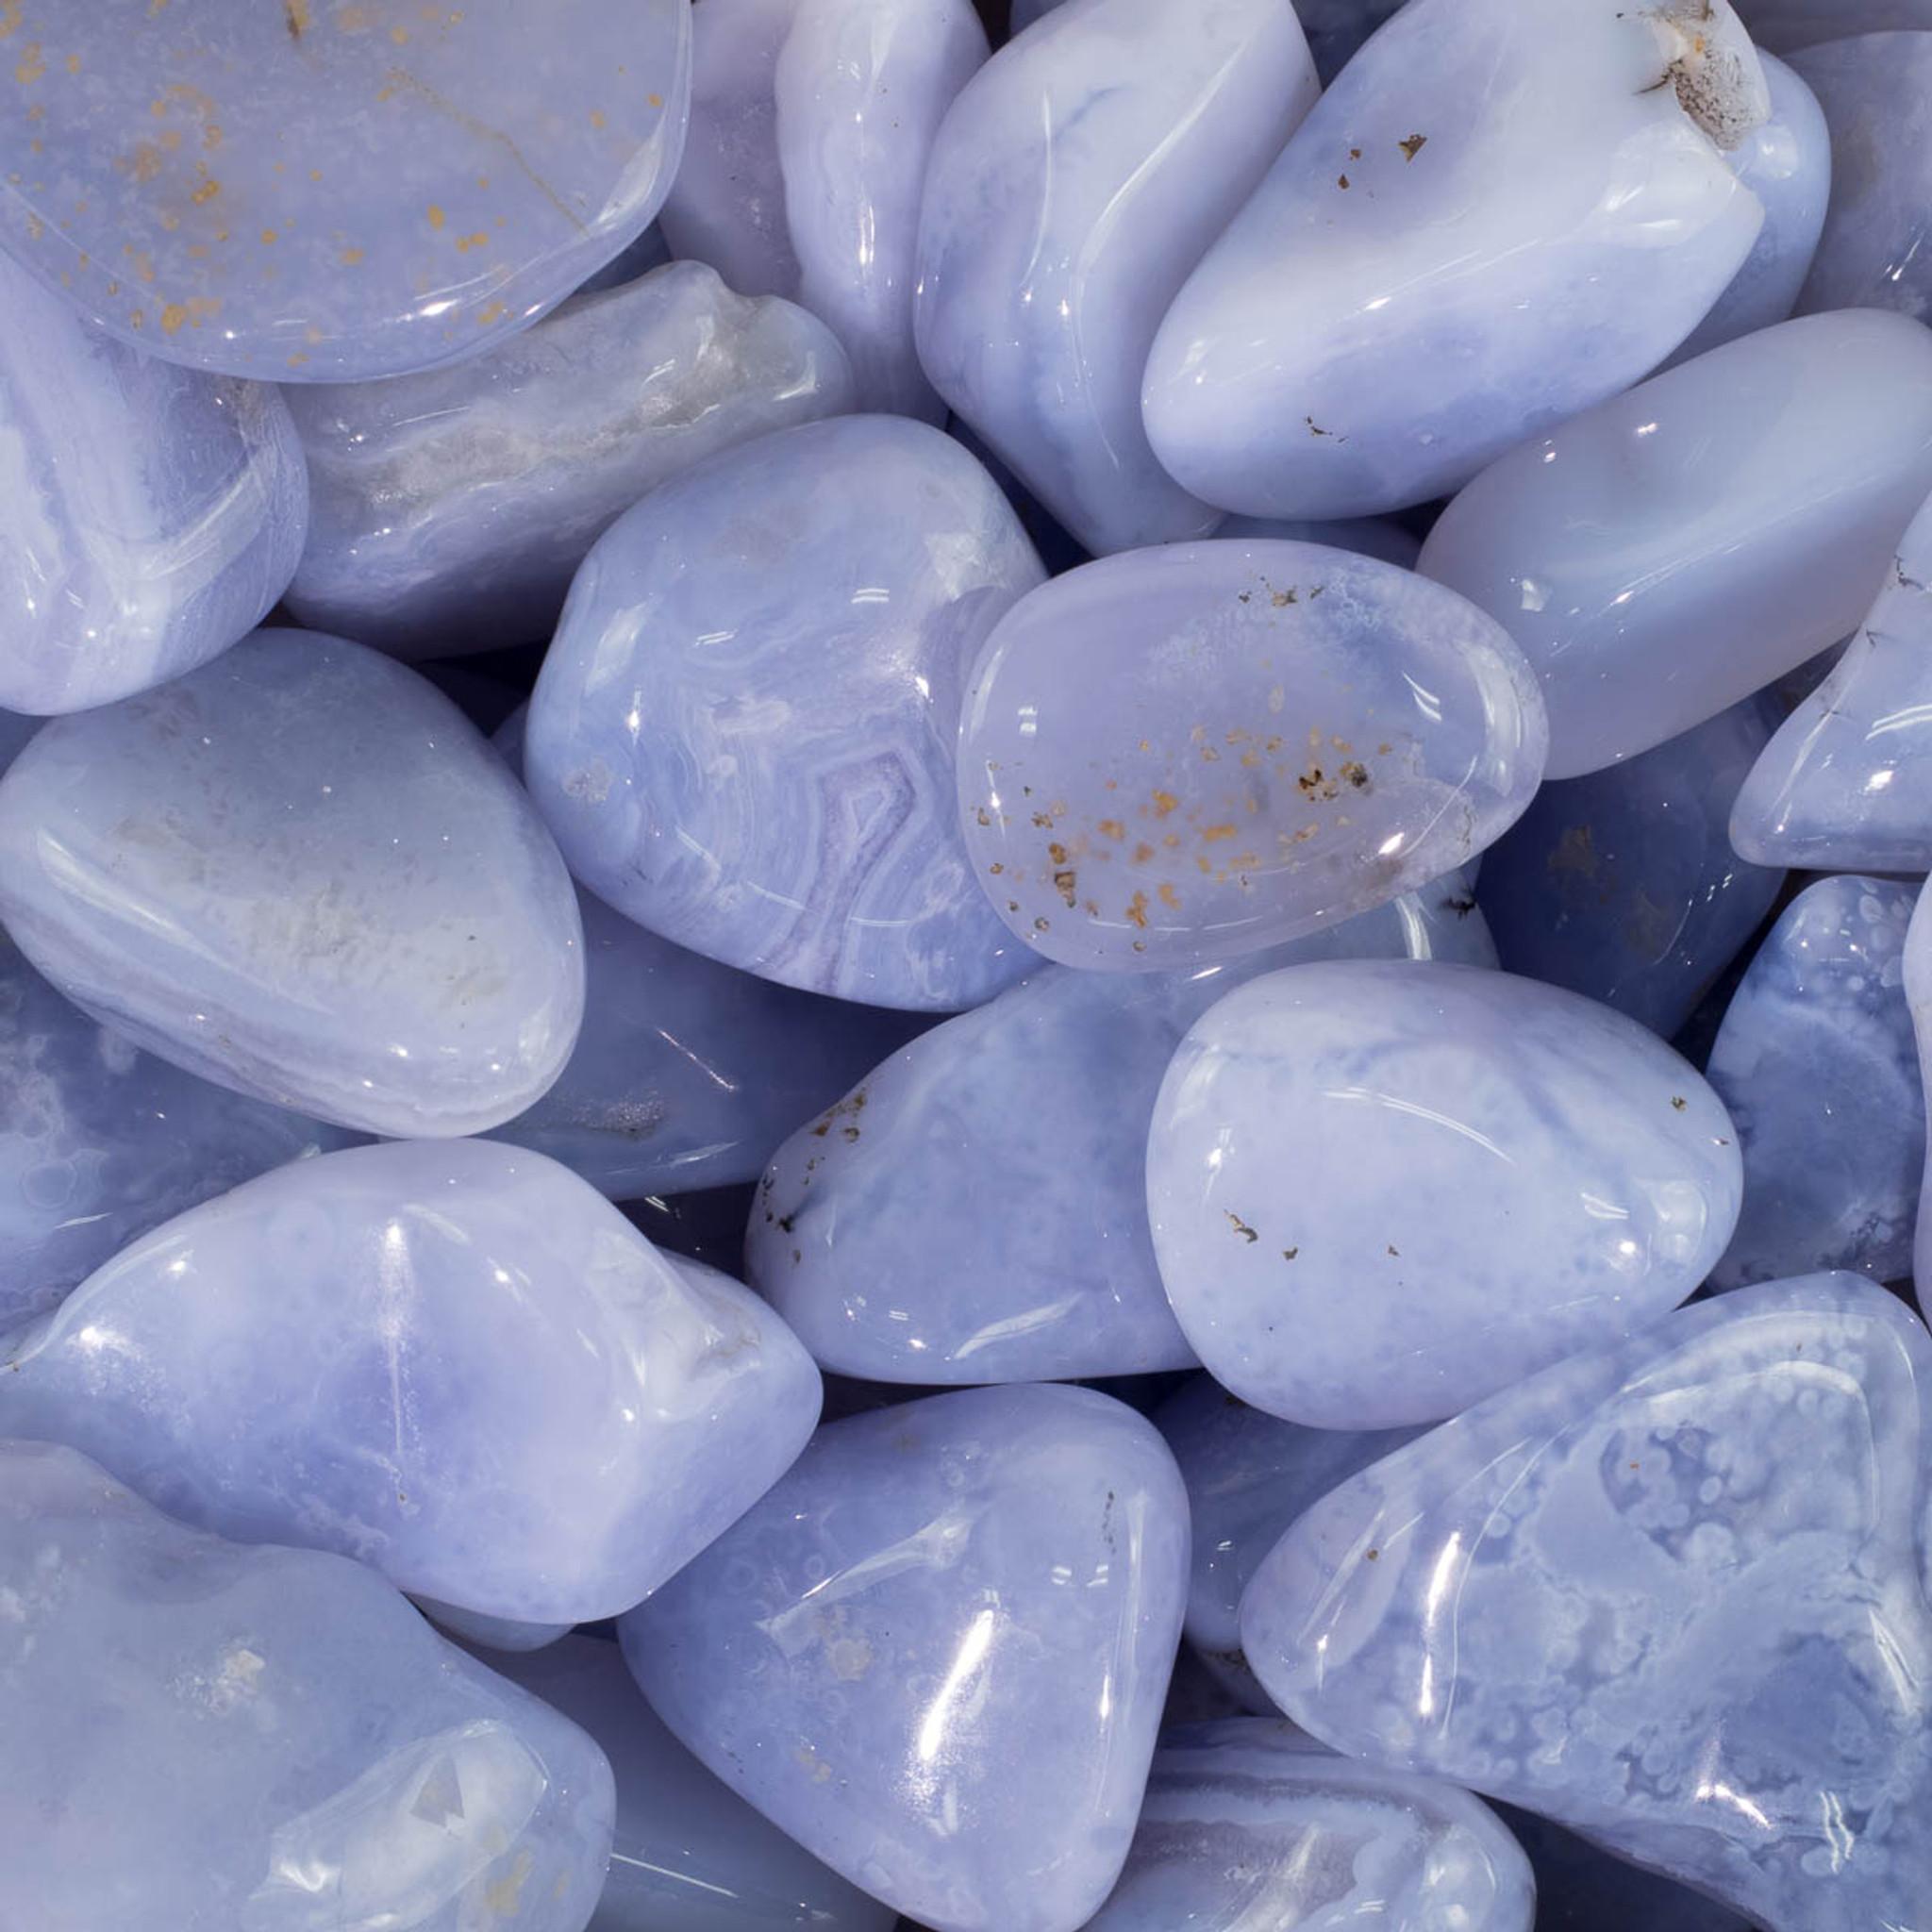 Blue Chalcedony Tumbled Stones | Healing Stones | Polished Stones